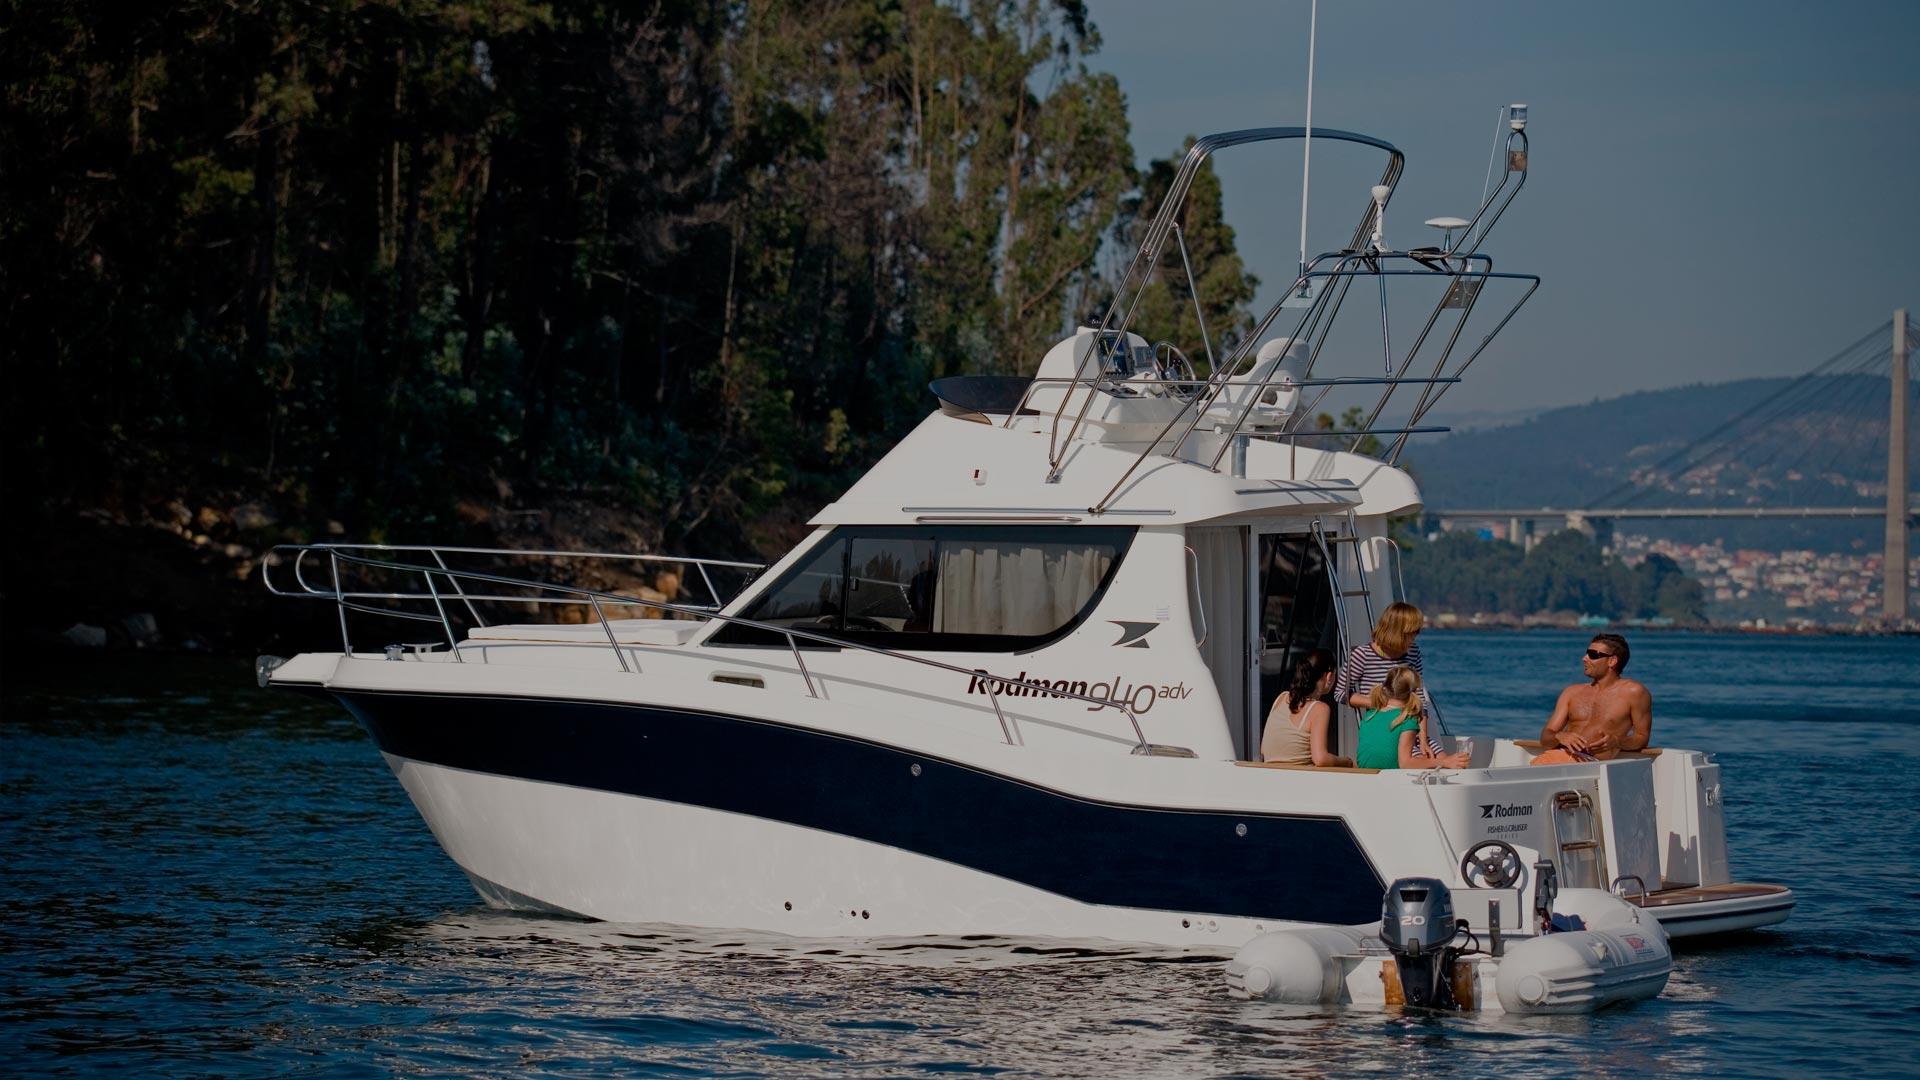 embarcaciones-rodman